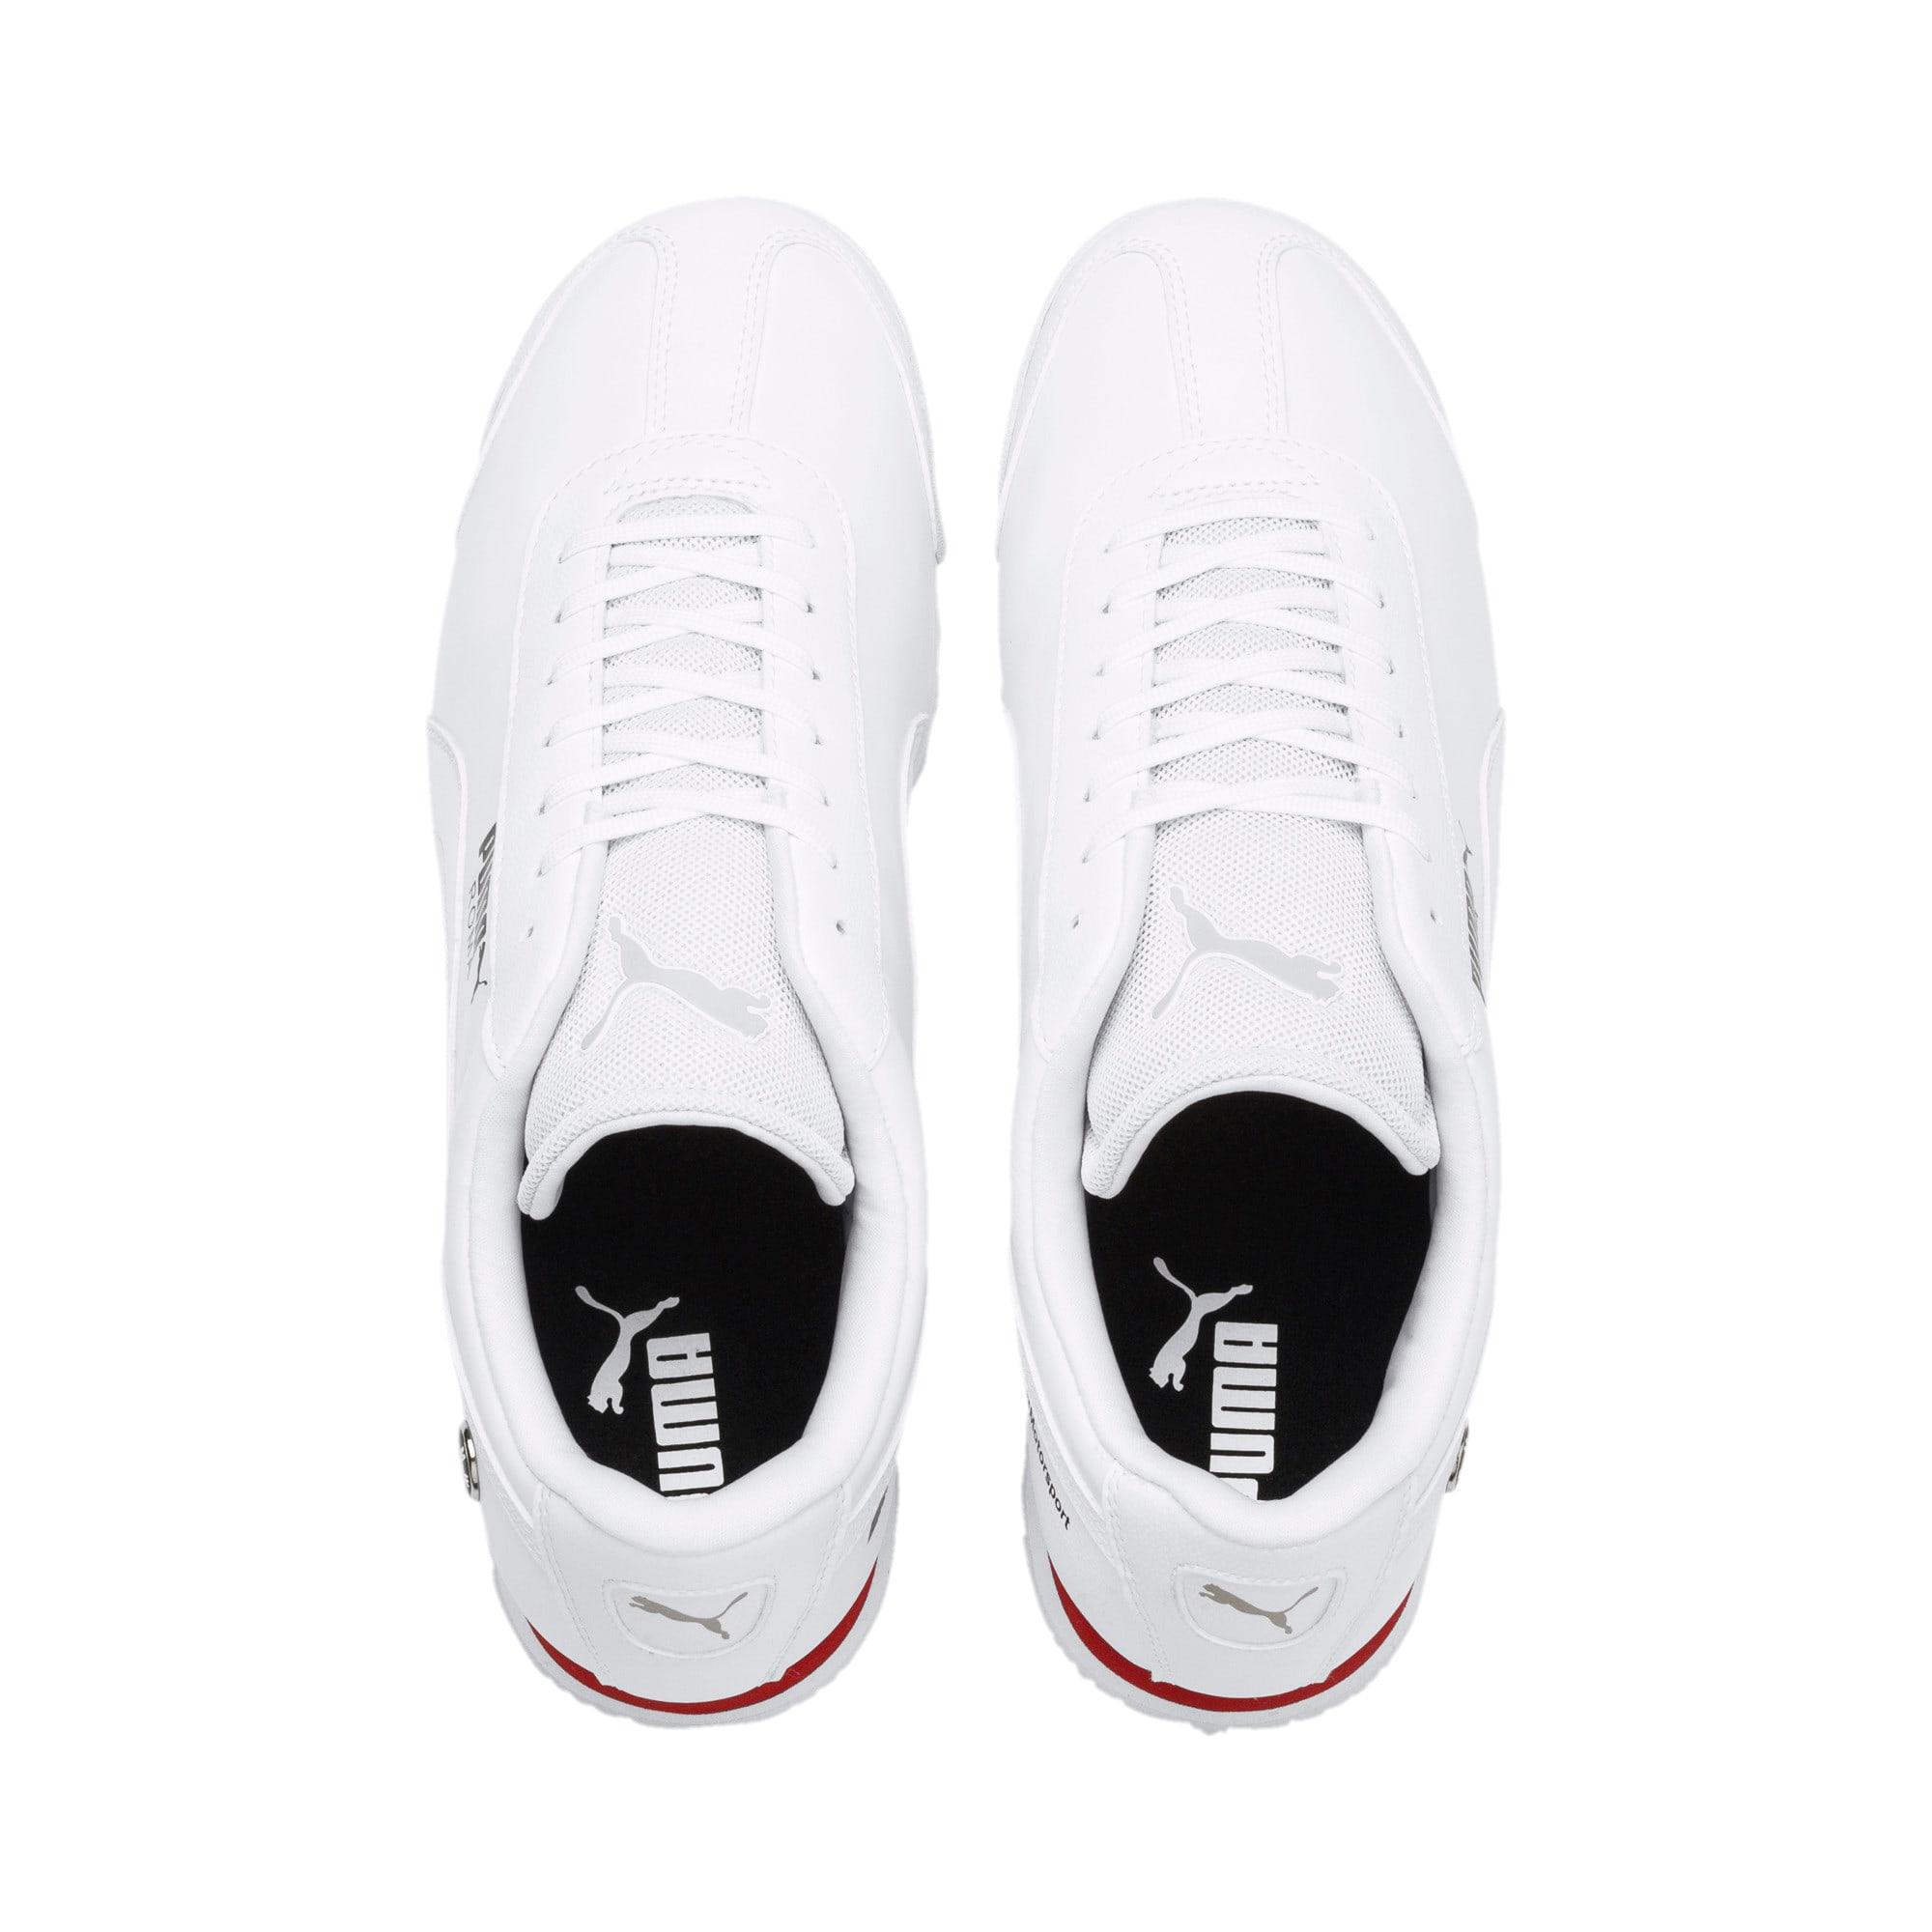 Thumbnail 6 of BMW M Motorsport Roma Men's Sneakers, Puma White-Puma White, medium